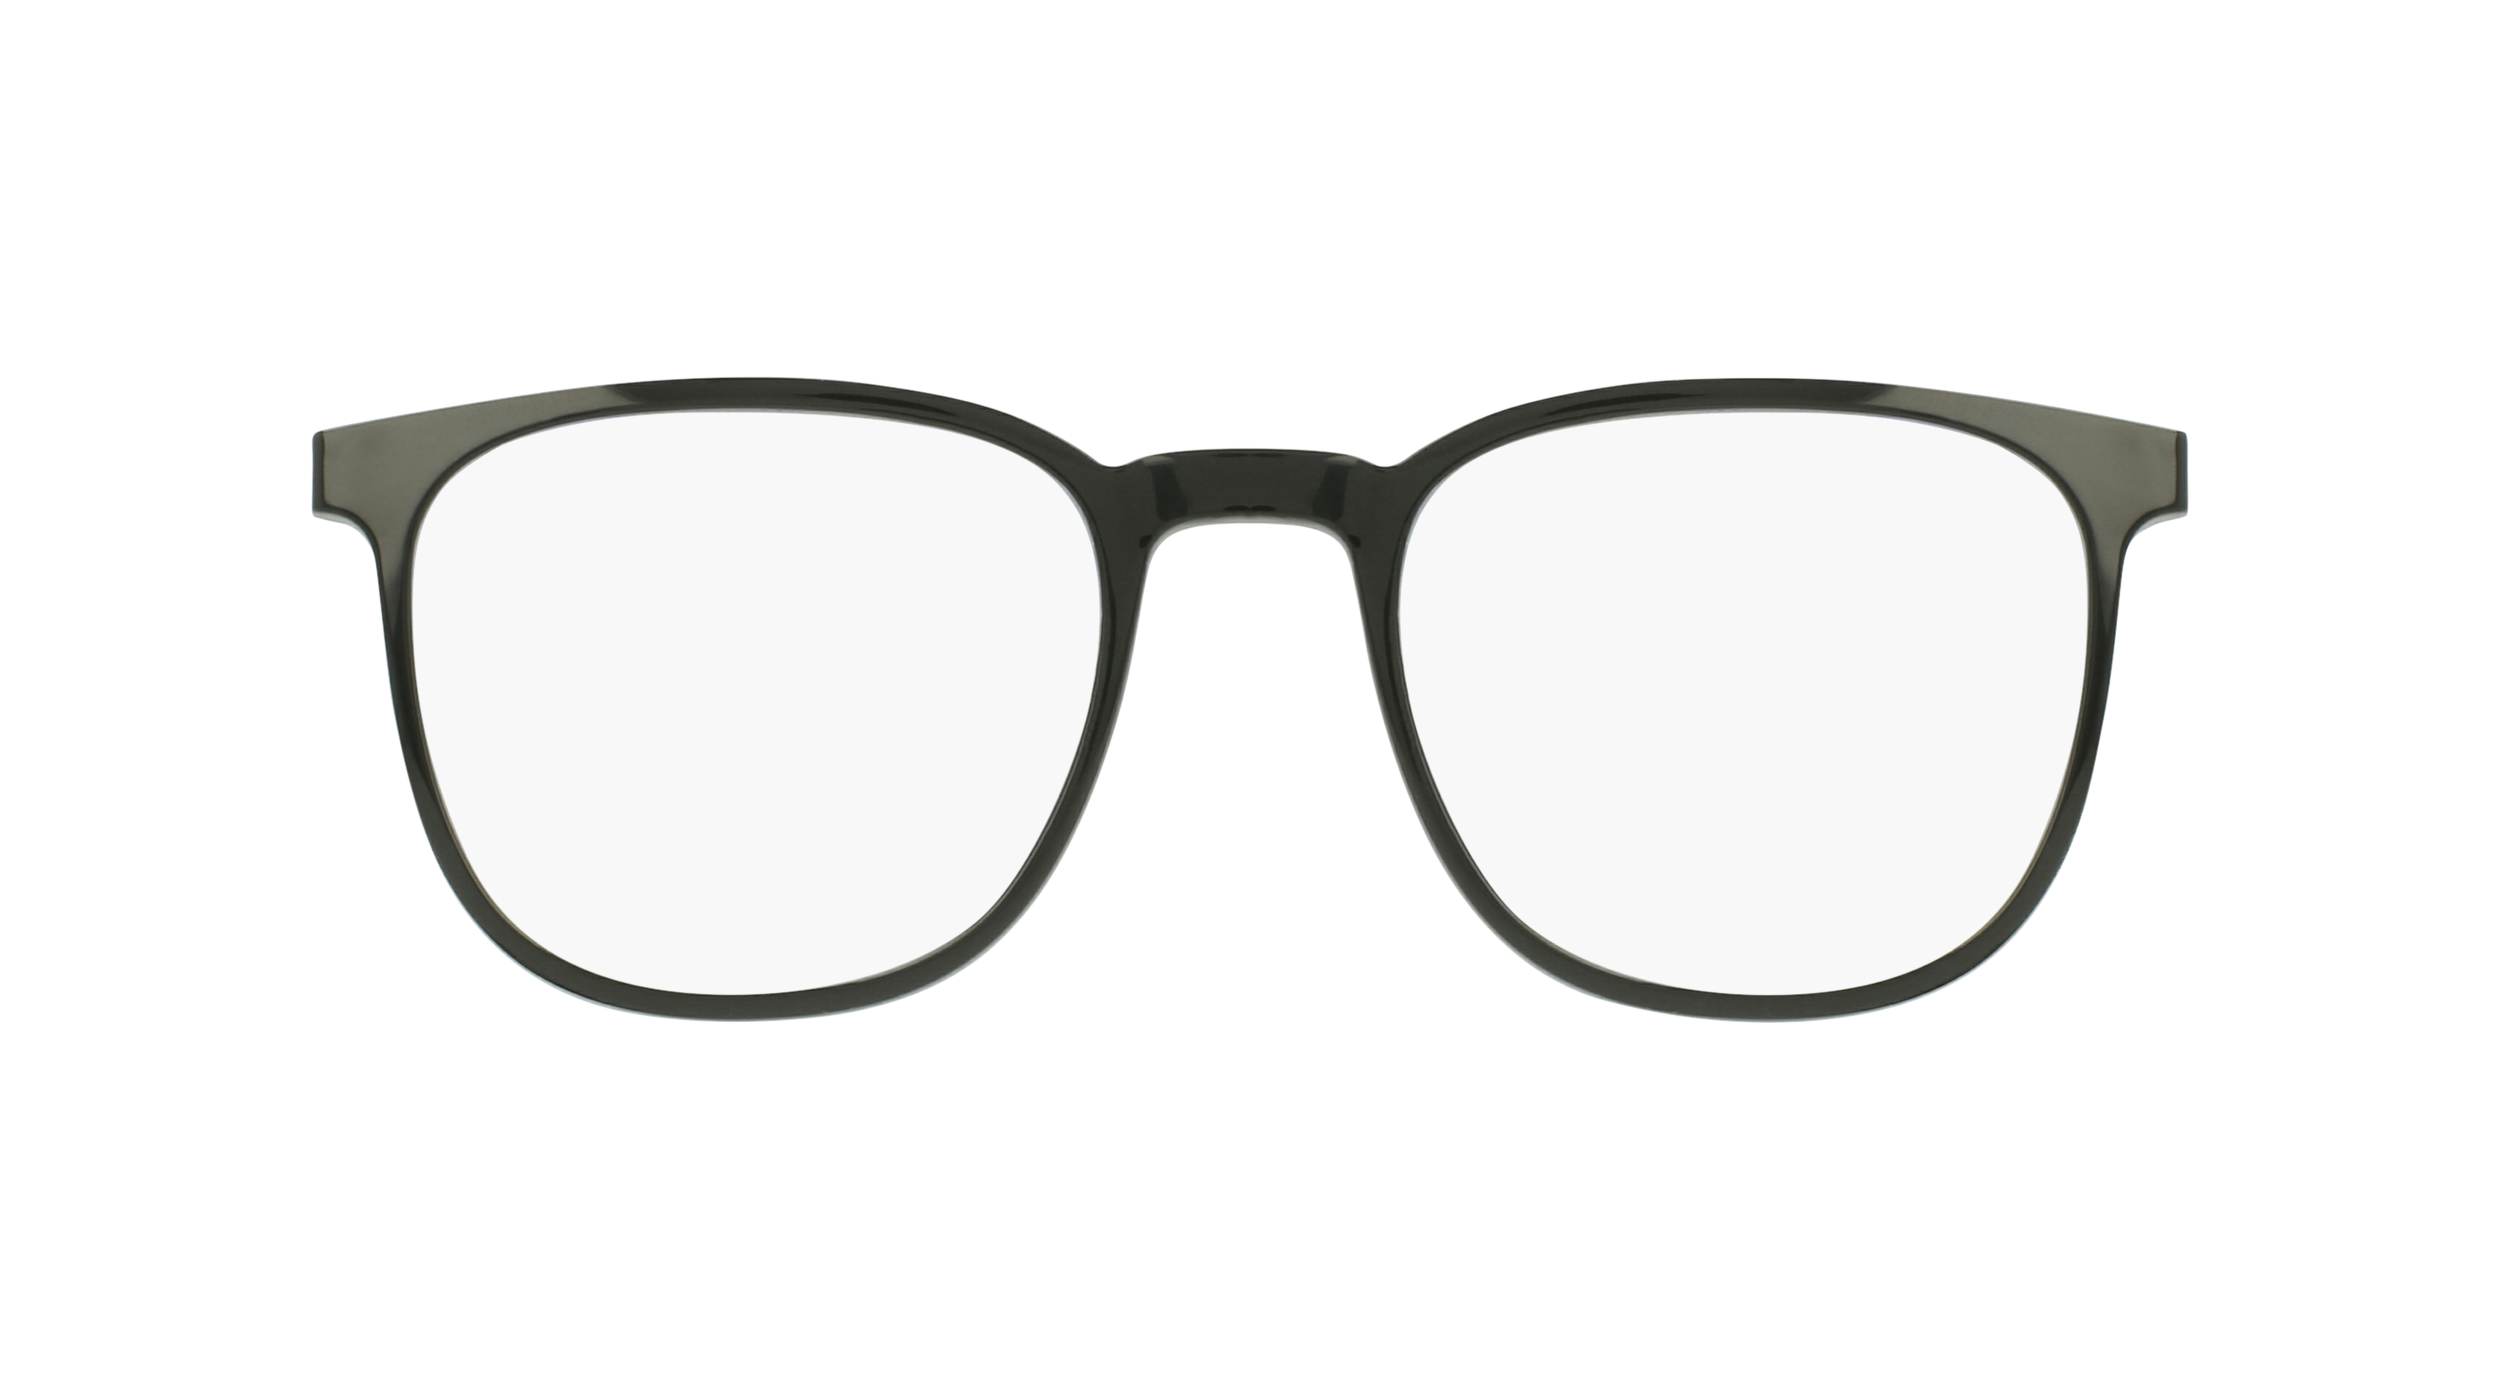 afflelou/france/products/smart_clip/clips_glasses/07630036457351.png